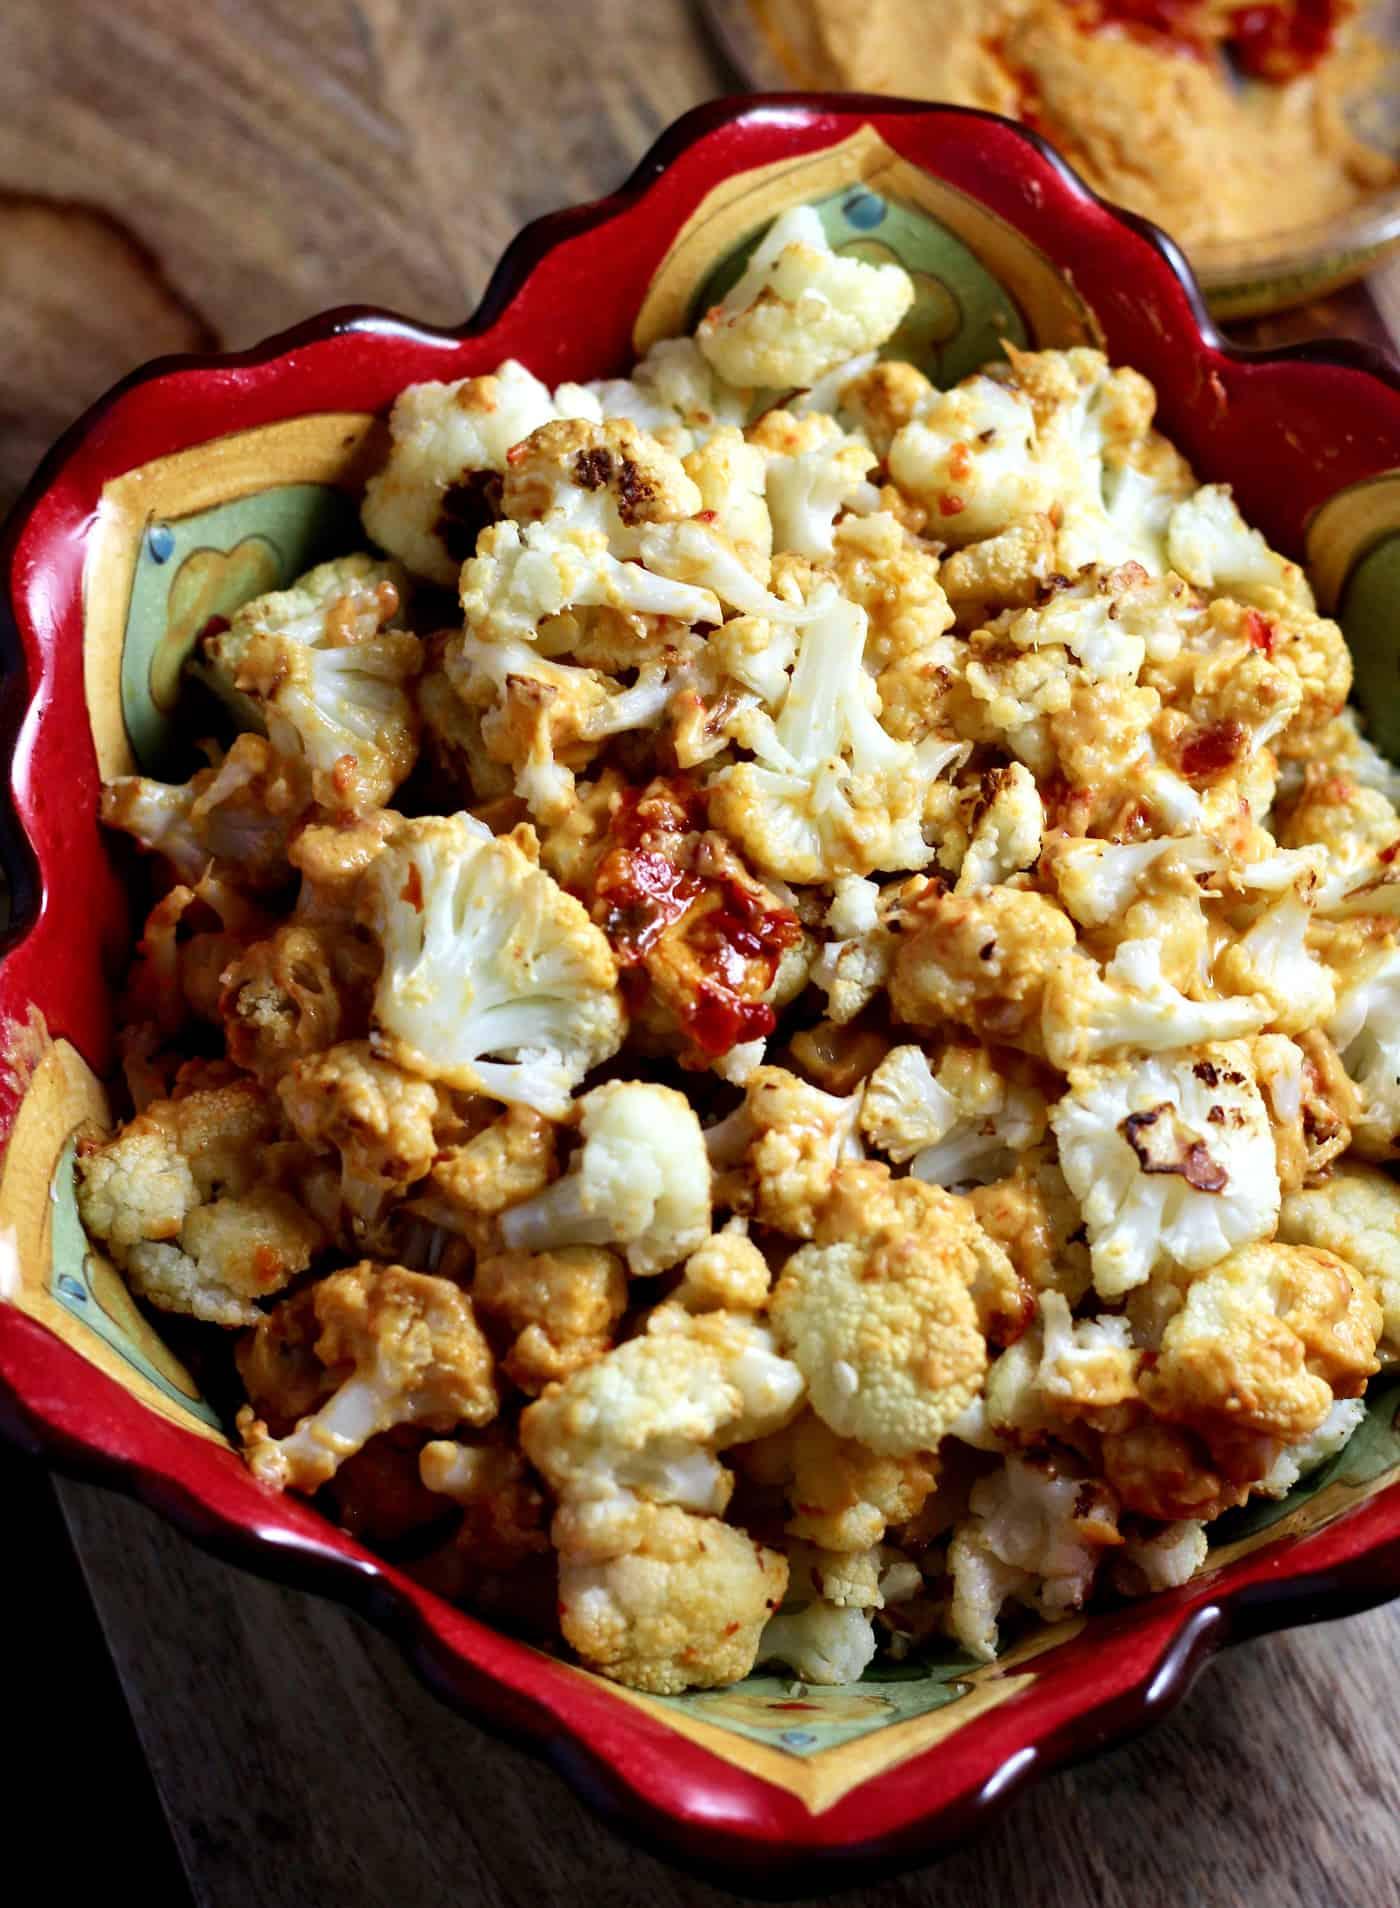 Roasted Cauliflower with Hummus